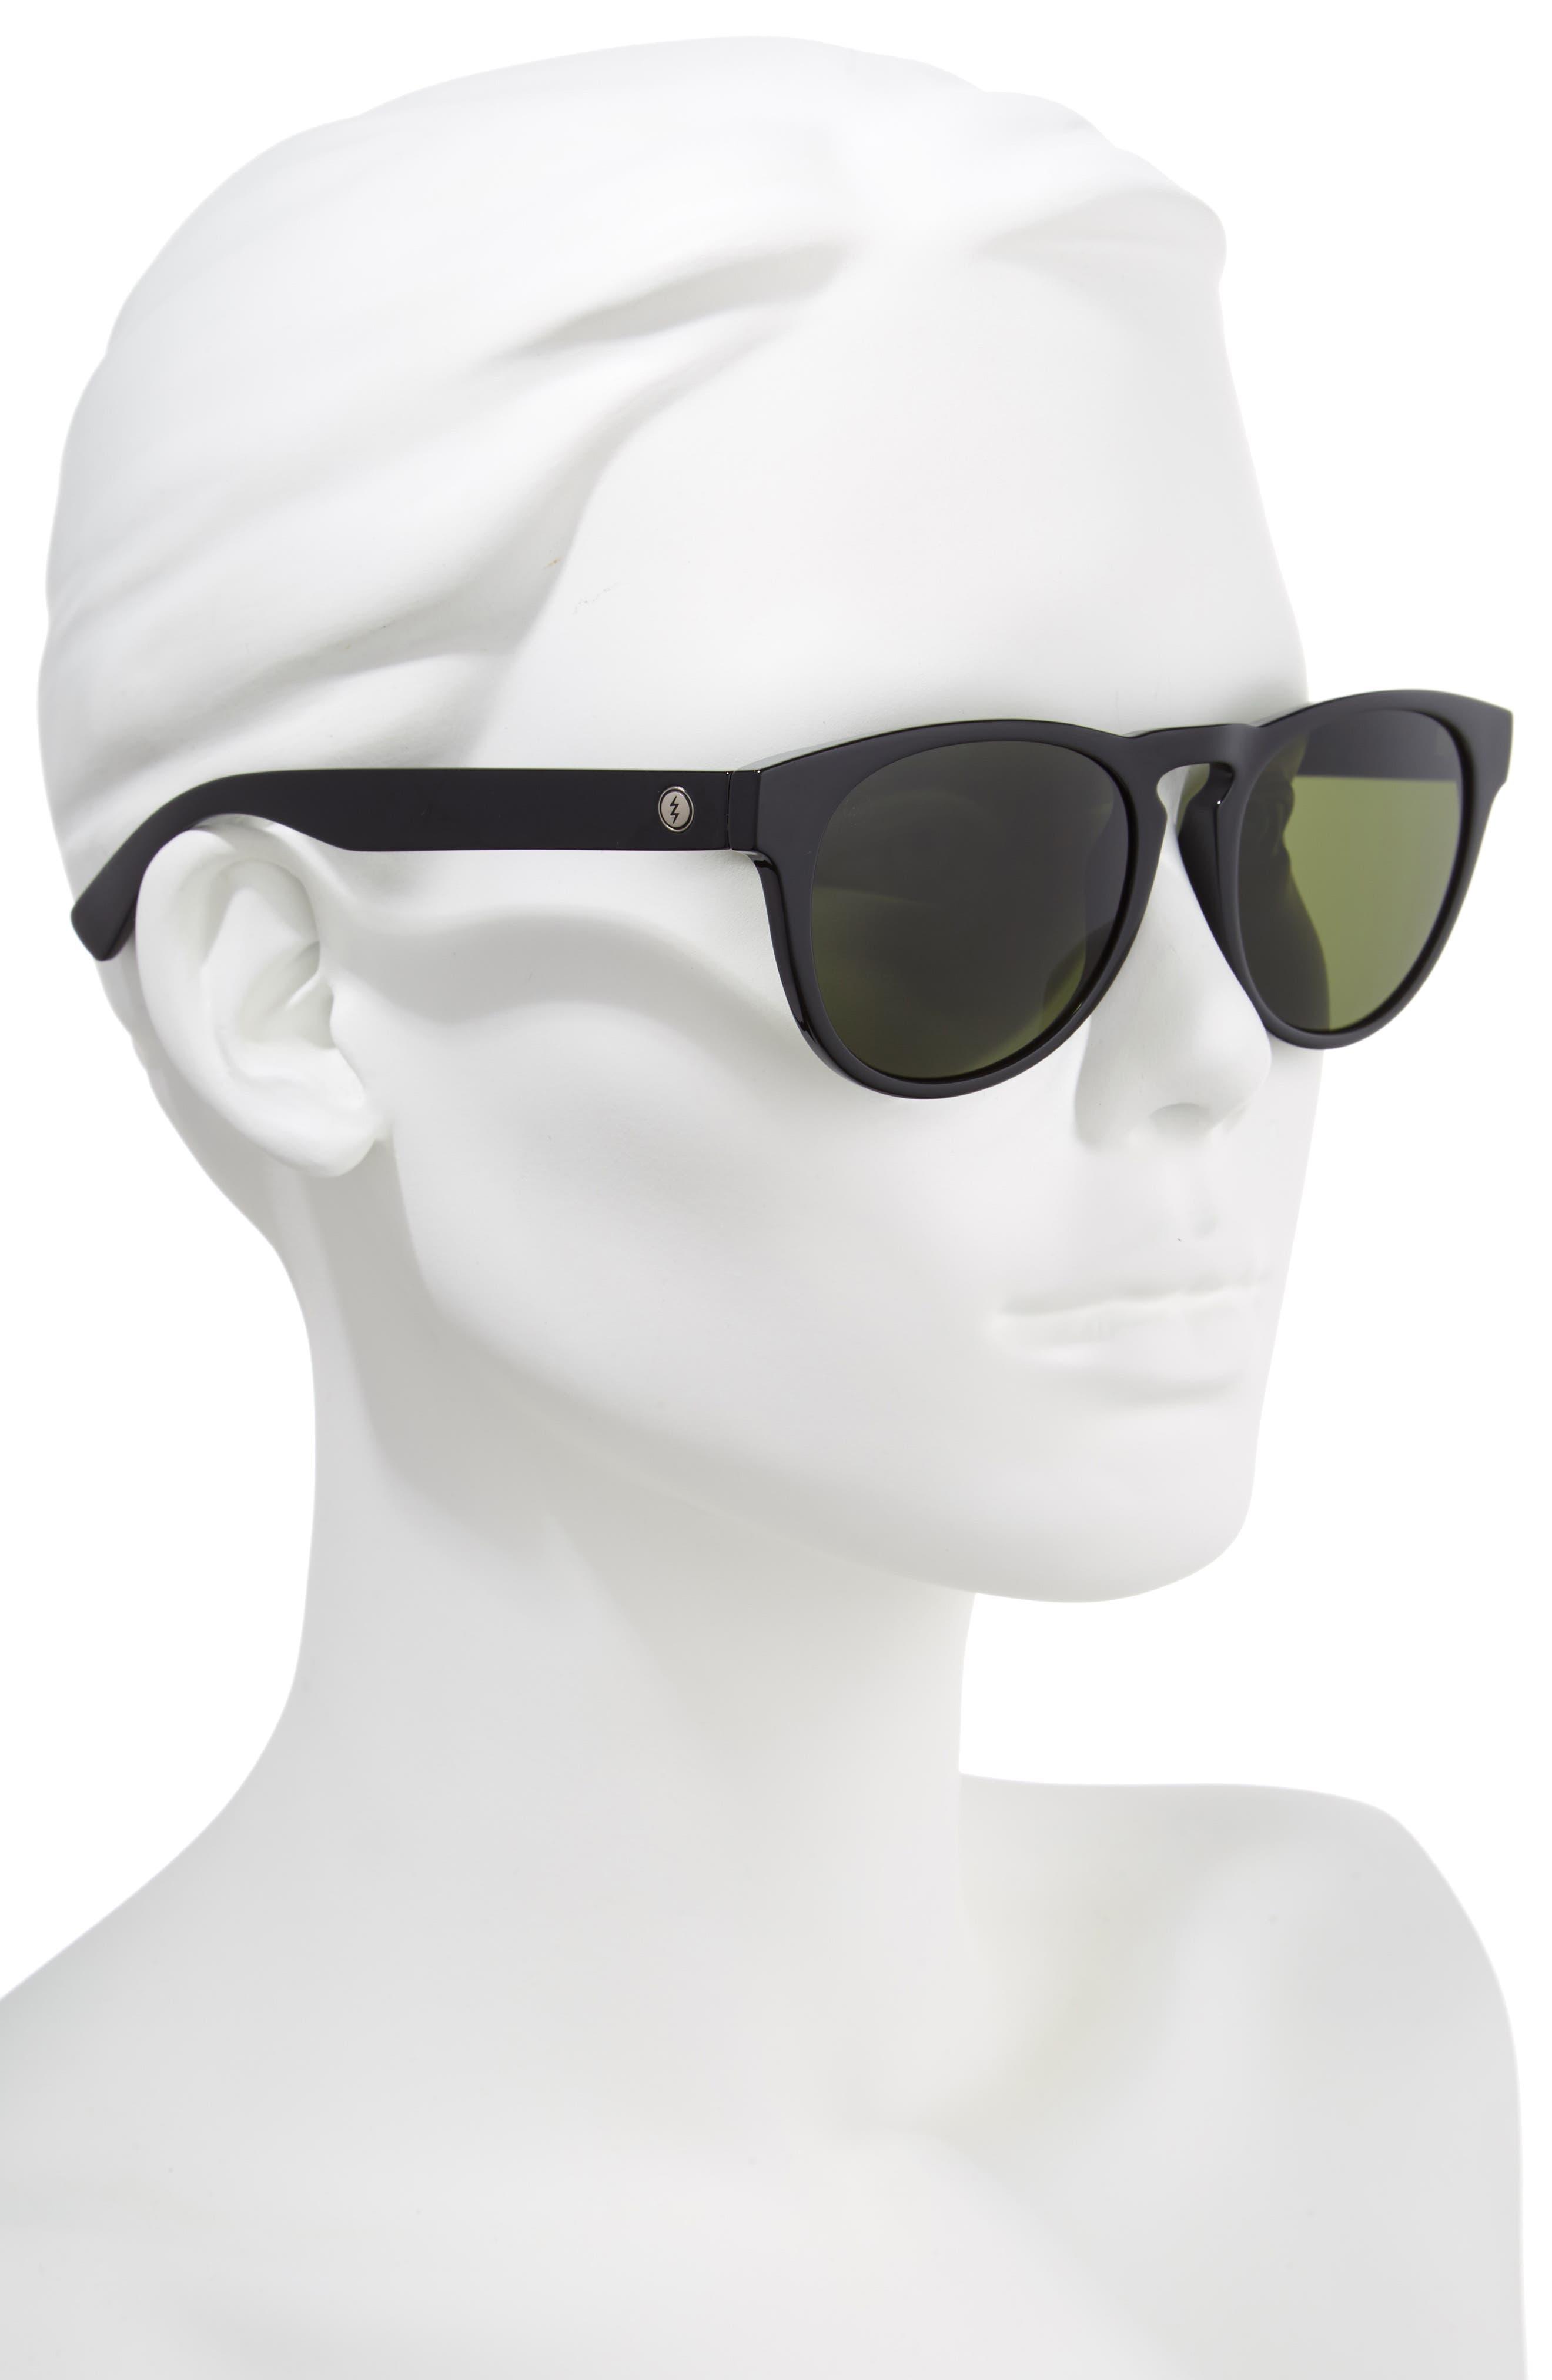 Nashville XL 52mm Melanin Infused Sunglasses,                             Alternate thumbnail 2, color,                             GLOSS BLACK/ GREY